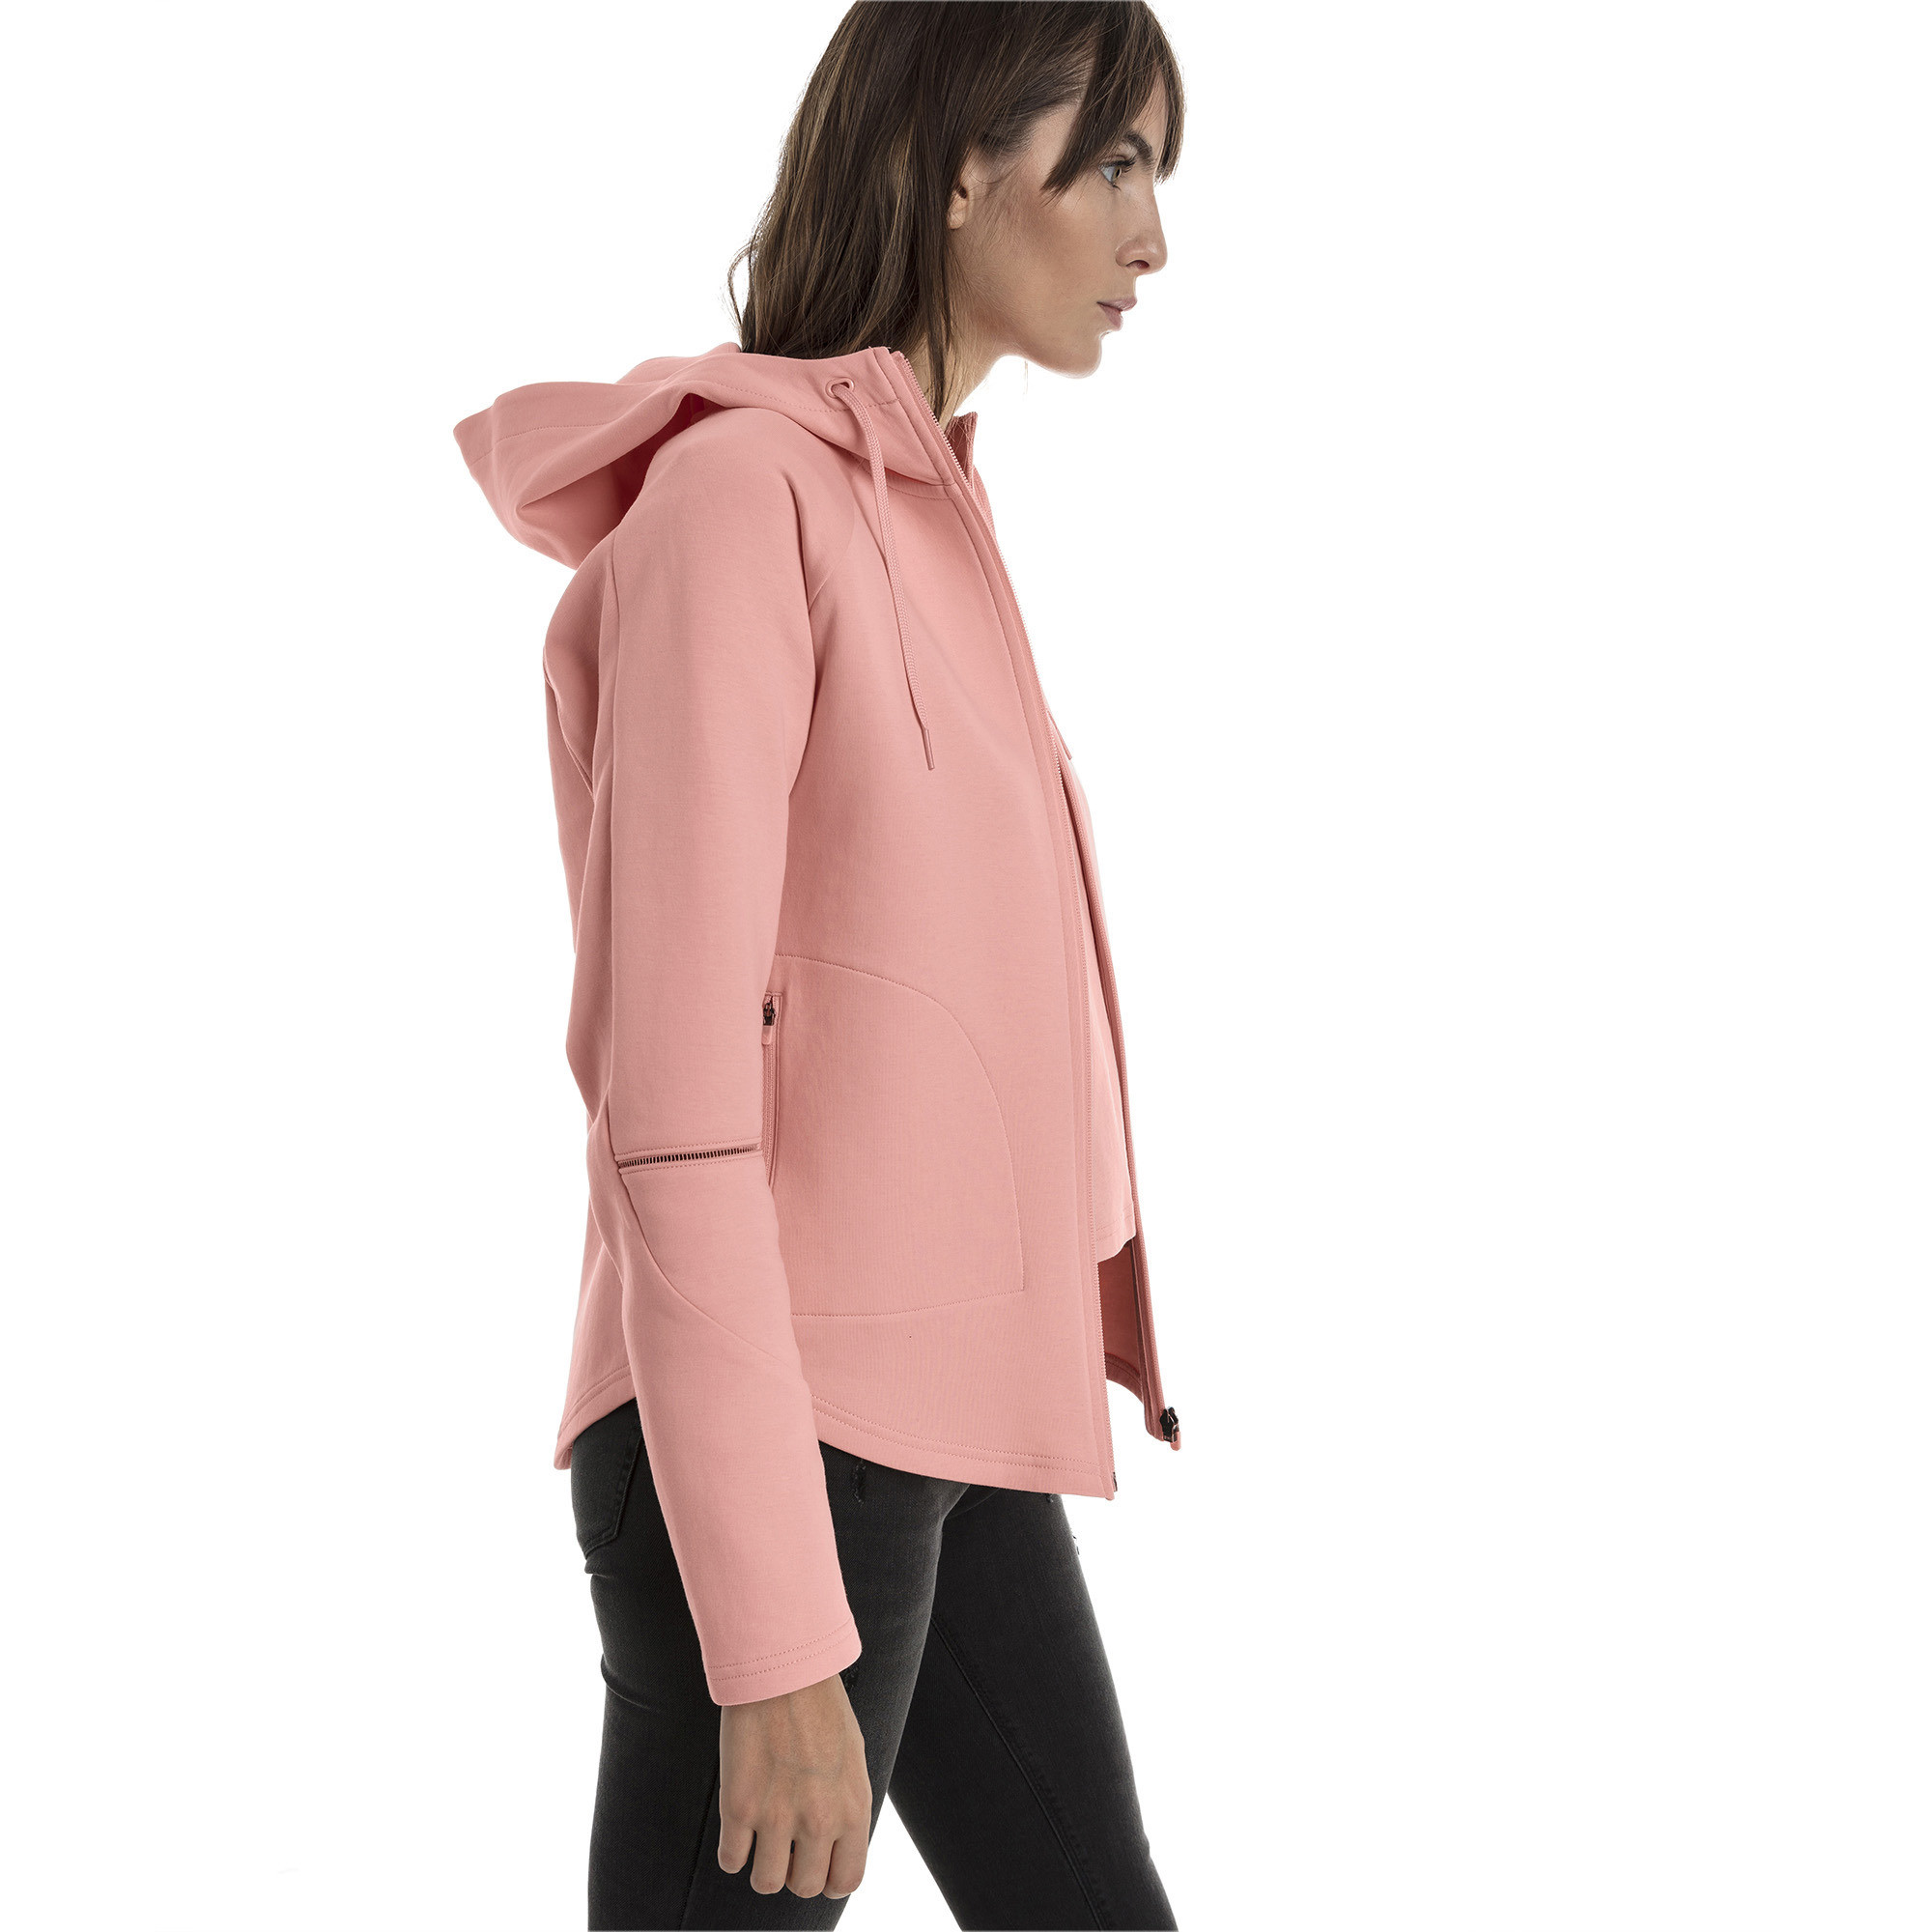 Image Puma Evostripe Move Zip-Up Women's Hoodie #2